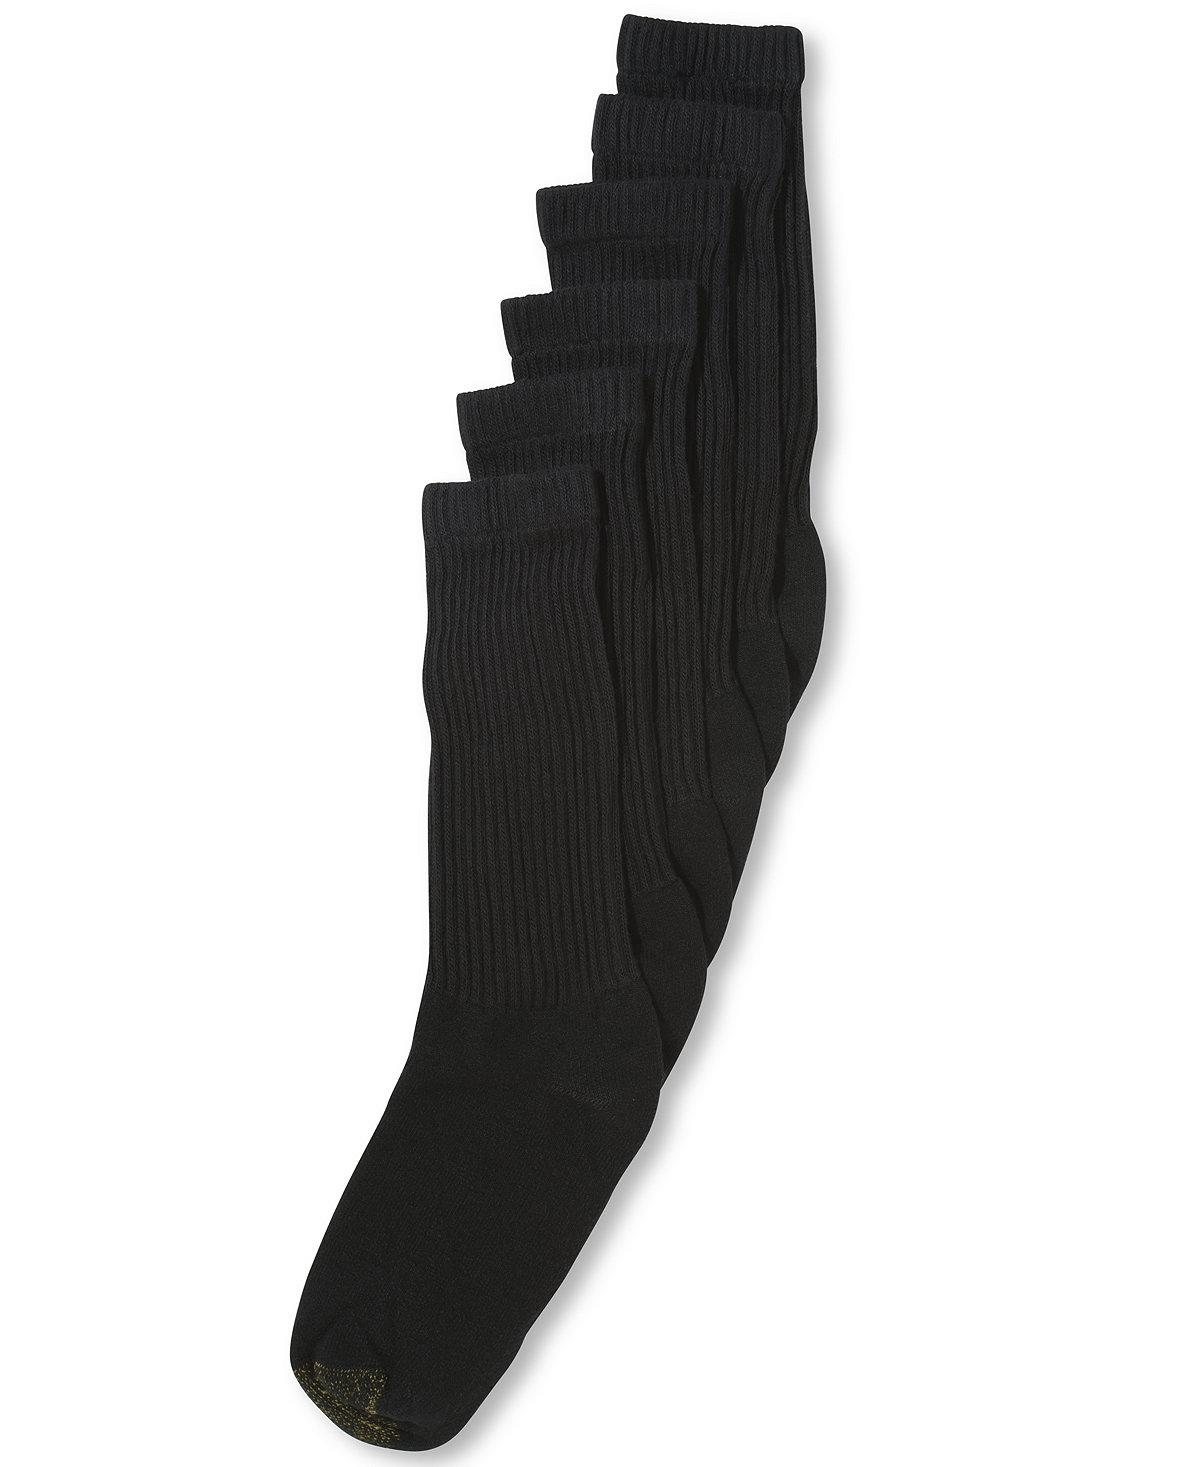 Gold Toe: 6-Pack Men's Crew or Quarter Athletic Socks $8.40, 6-Pack Women's Soft Liner Socks $4.89, + $5 in Macys Money on $25+, More + $2.55 shipping or free store pickup at Macys